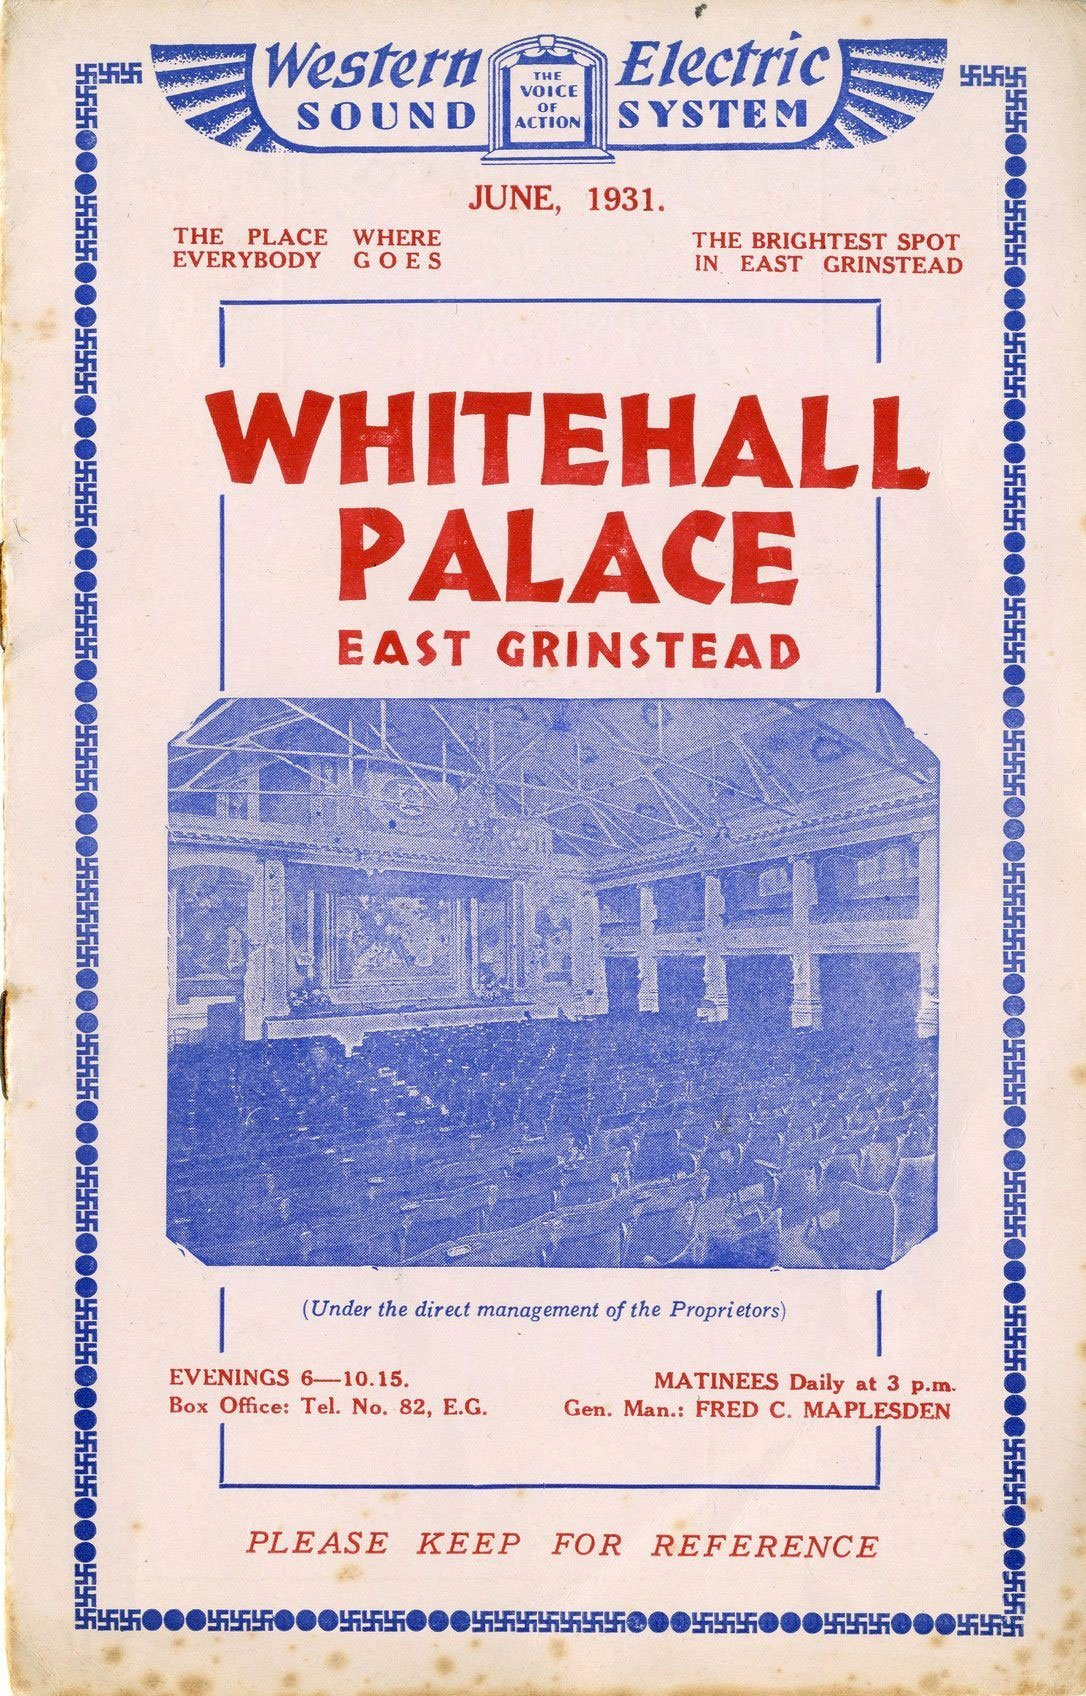 East Grinstead Museum – Whitehall Palace East Grinstead programme